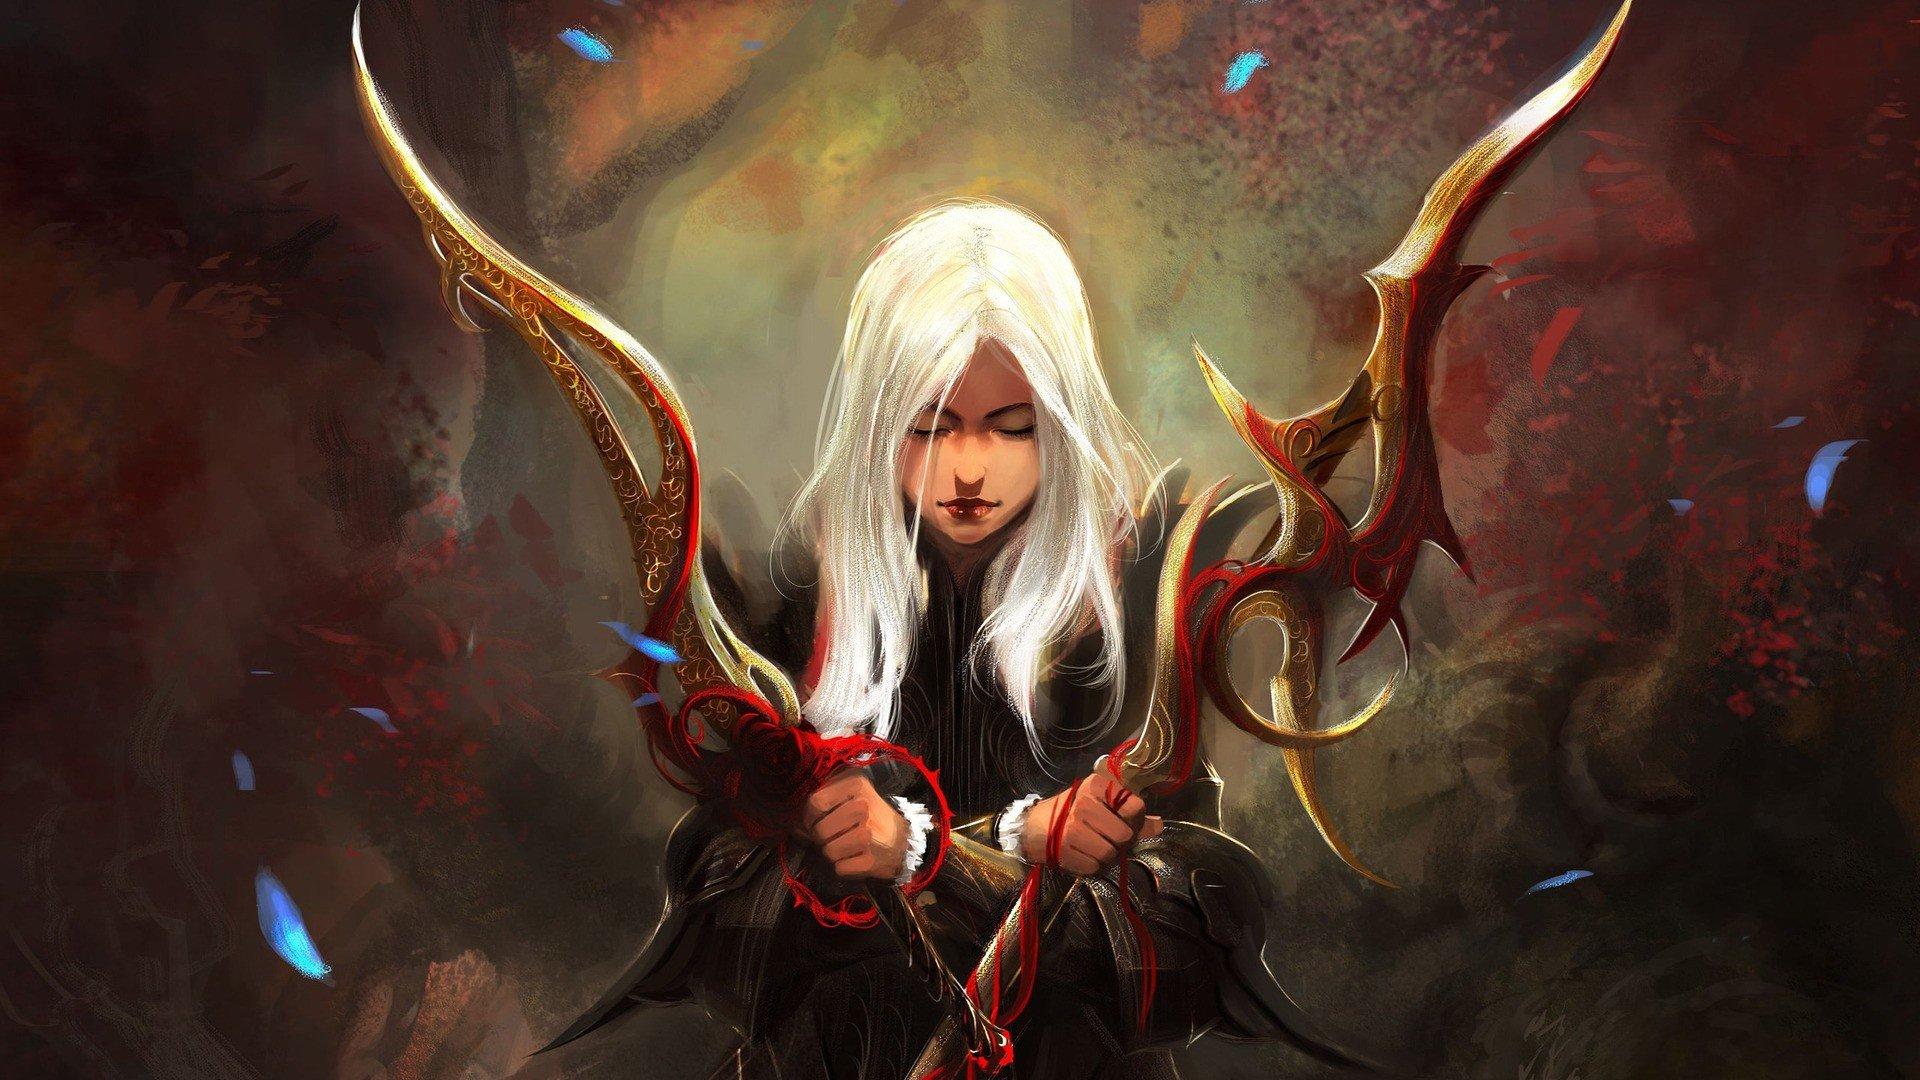 artwork-fantasy-art-women-warriors-concept-art